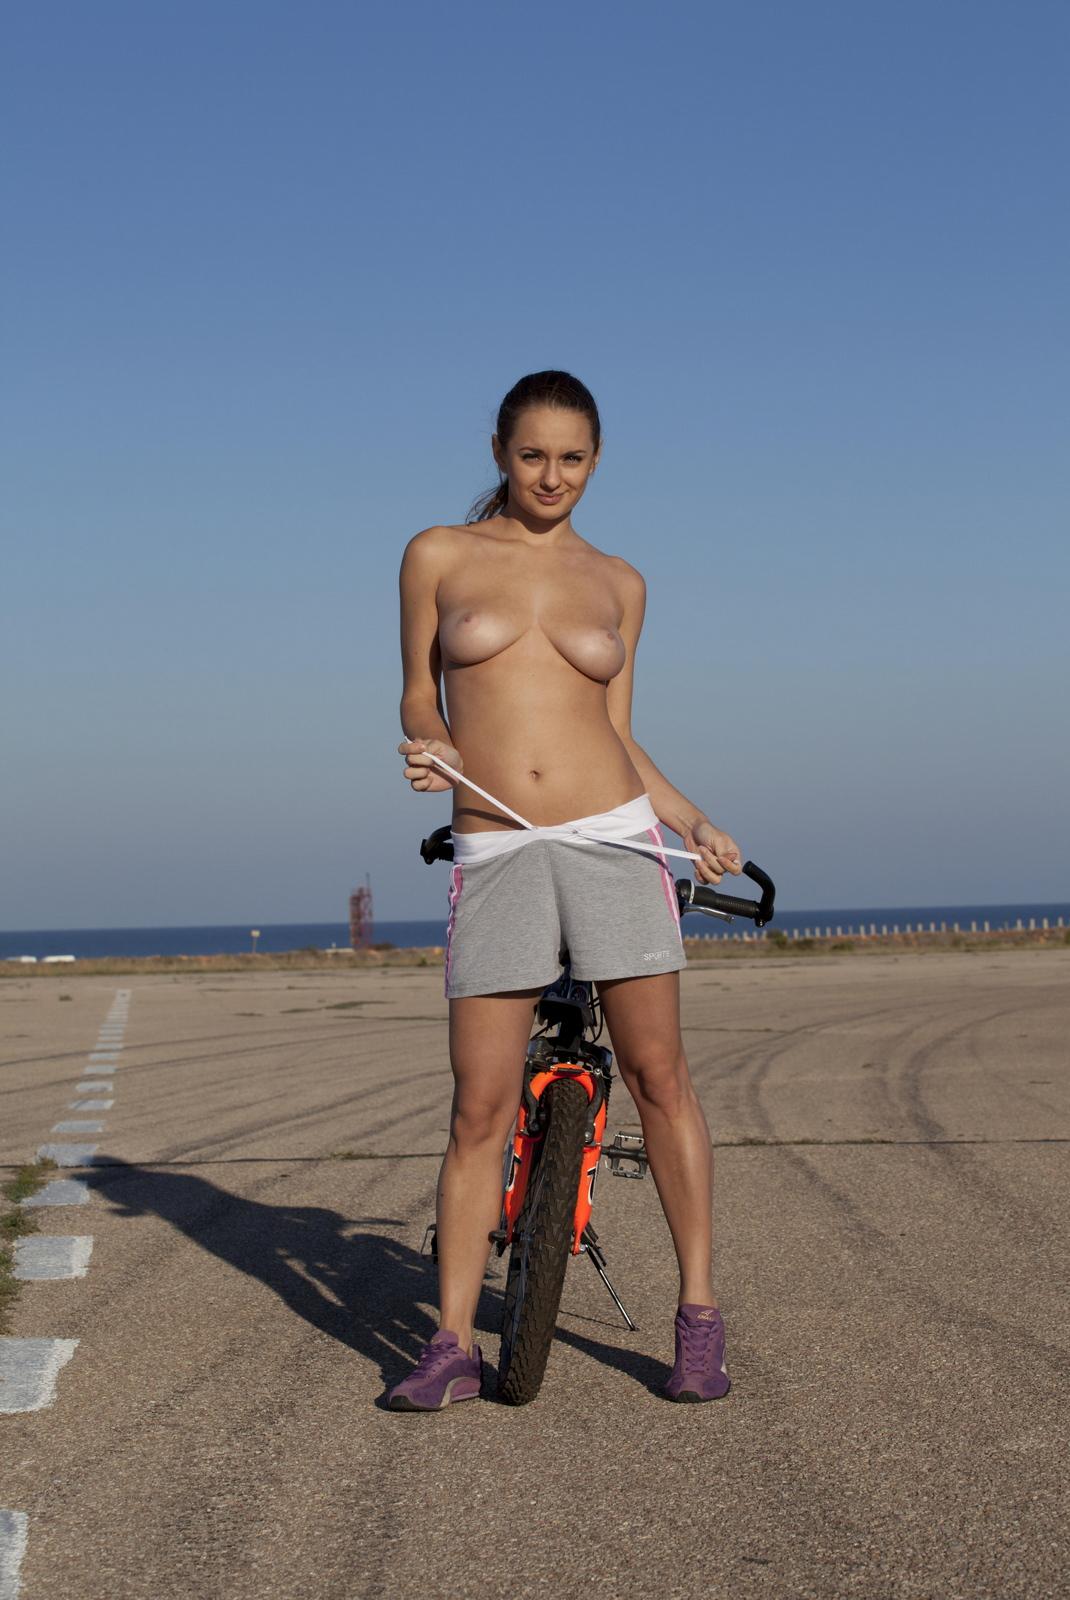 mishel-c-bicycle-boobs-naked-domai-06